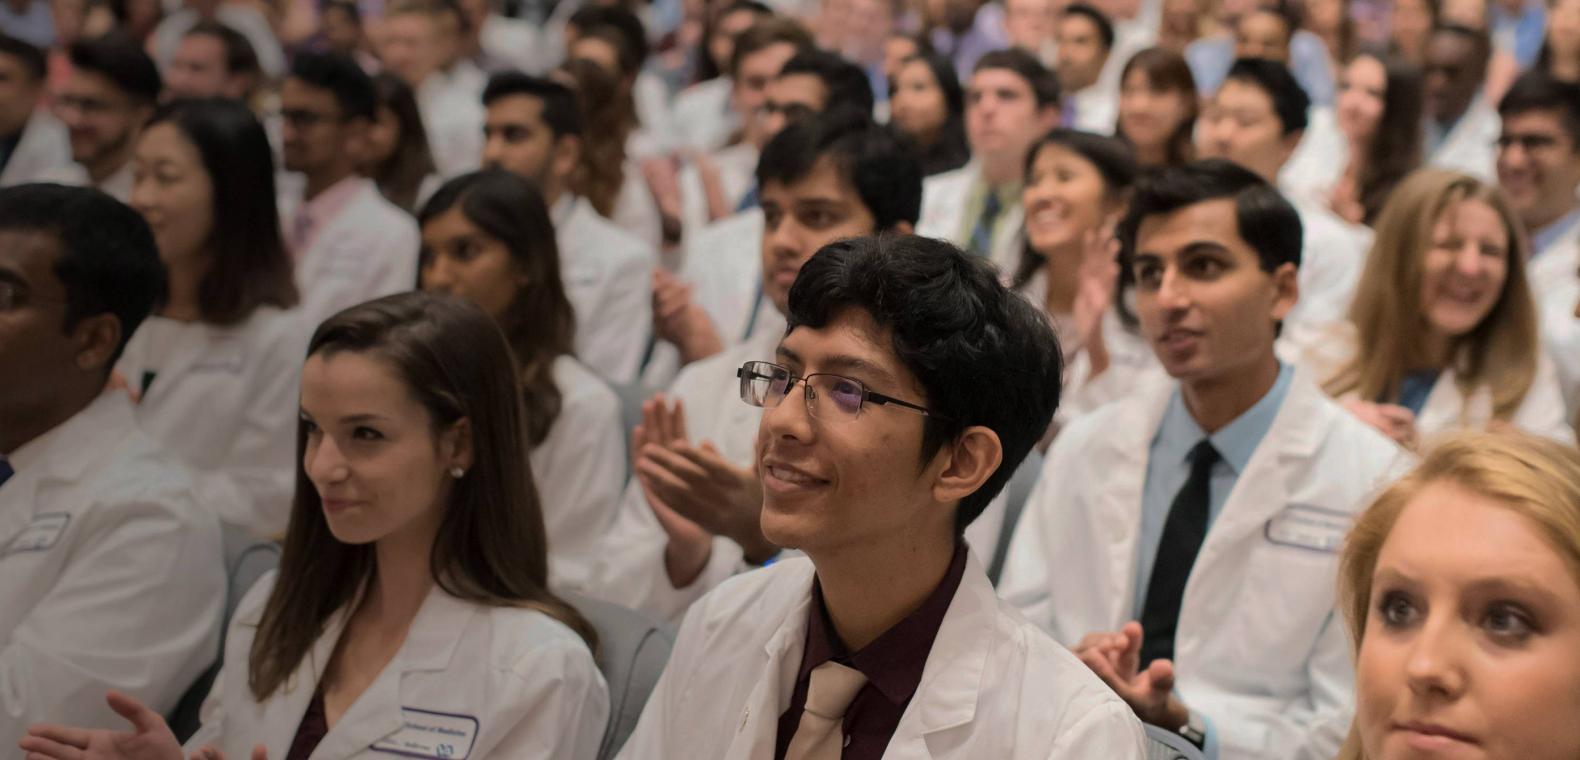 MD Admissions | NYU School of Medicine | NYU Langone Health